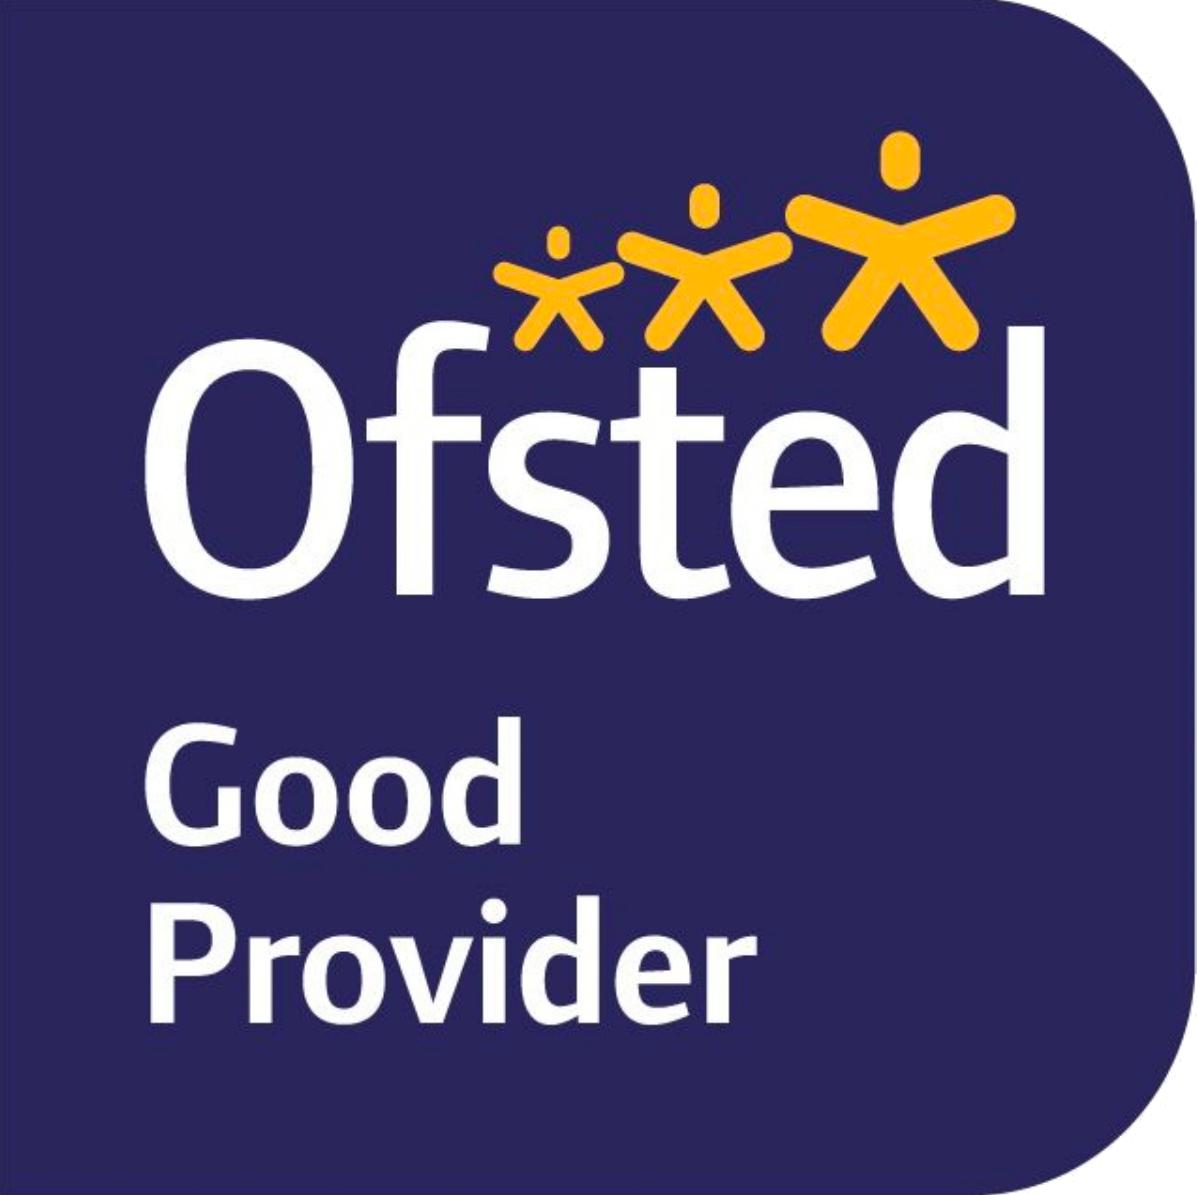 Image of Ofsted Good Provider Logo, a partner of JTL